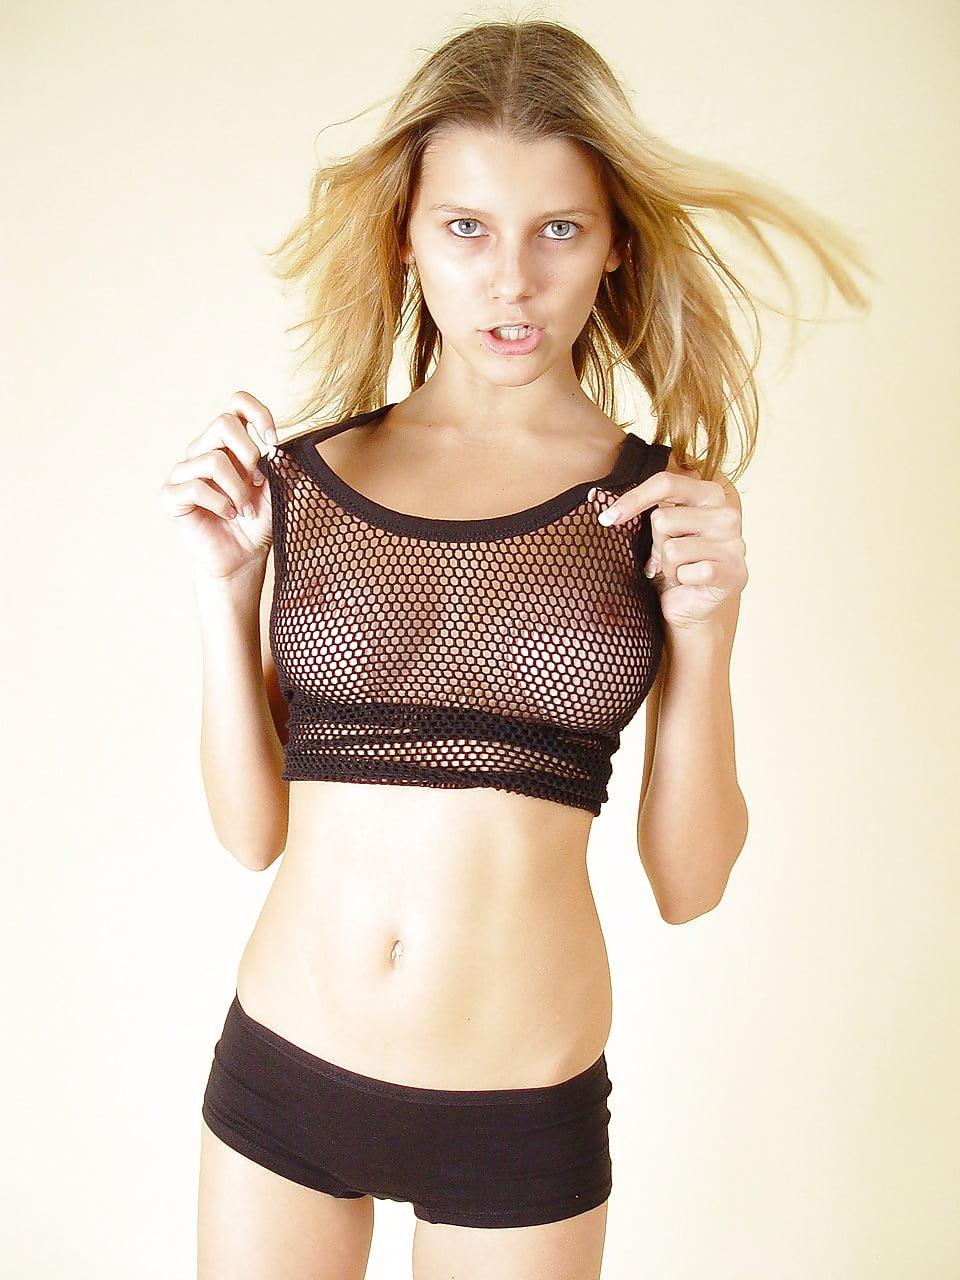 Jflo topless — pic 6